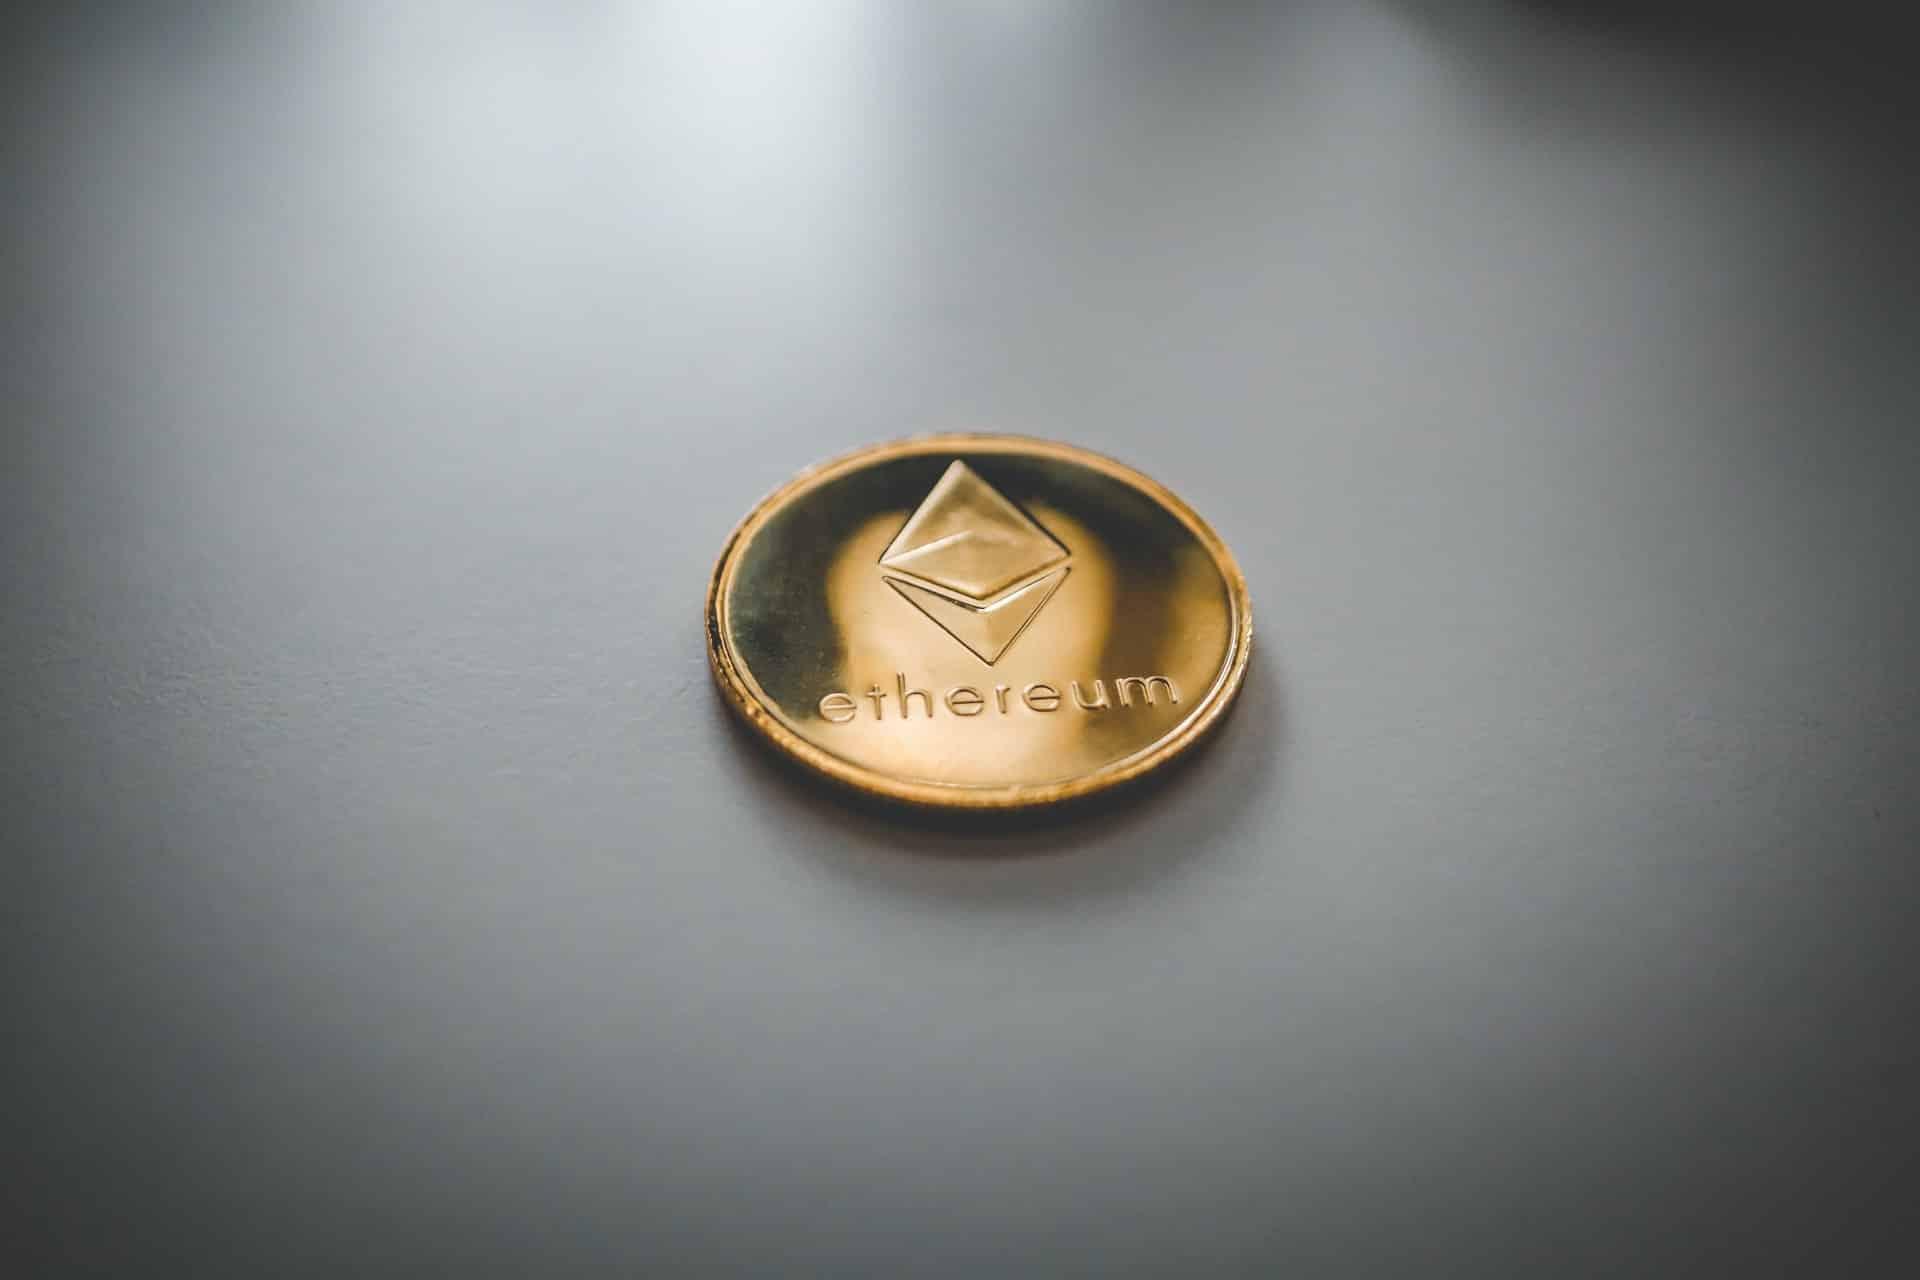 Ethereum Investment Guide Header Image